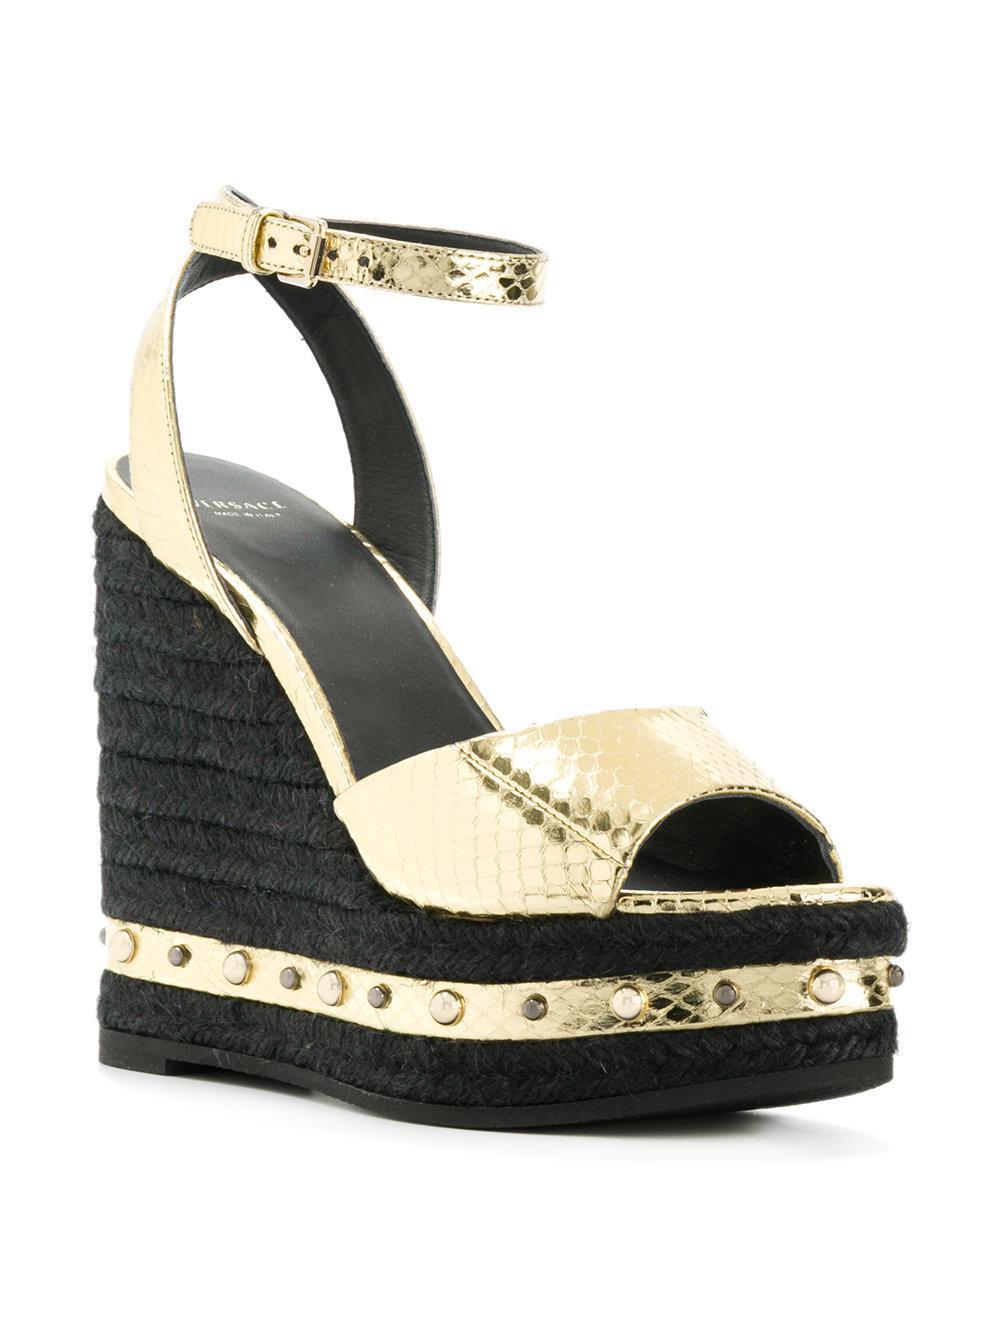 Versace In Metallic Lyst Sandals Wedge 6Yby7fg